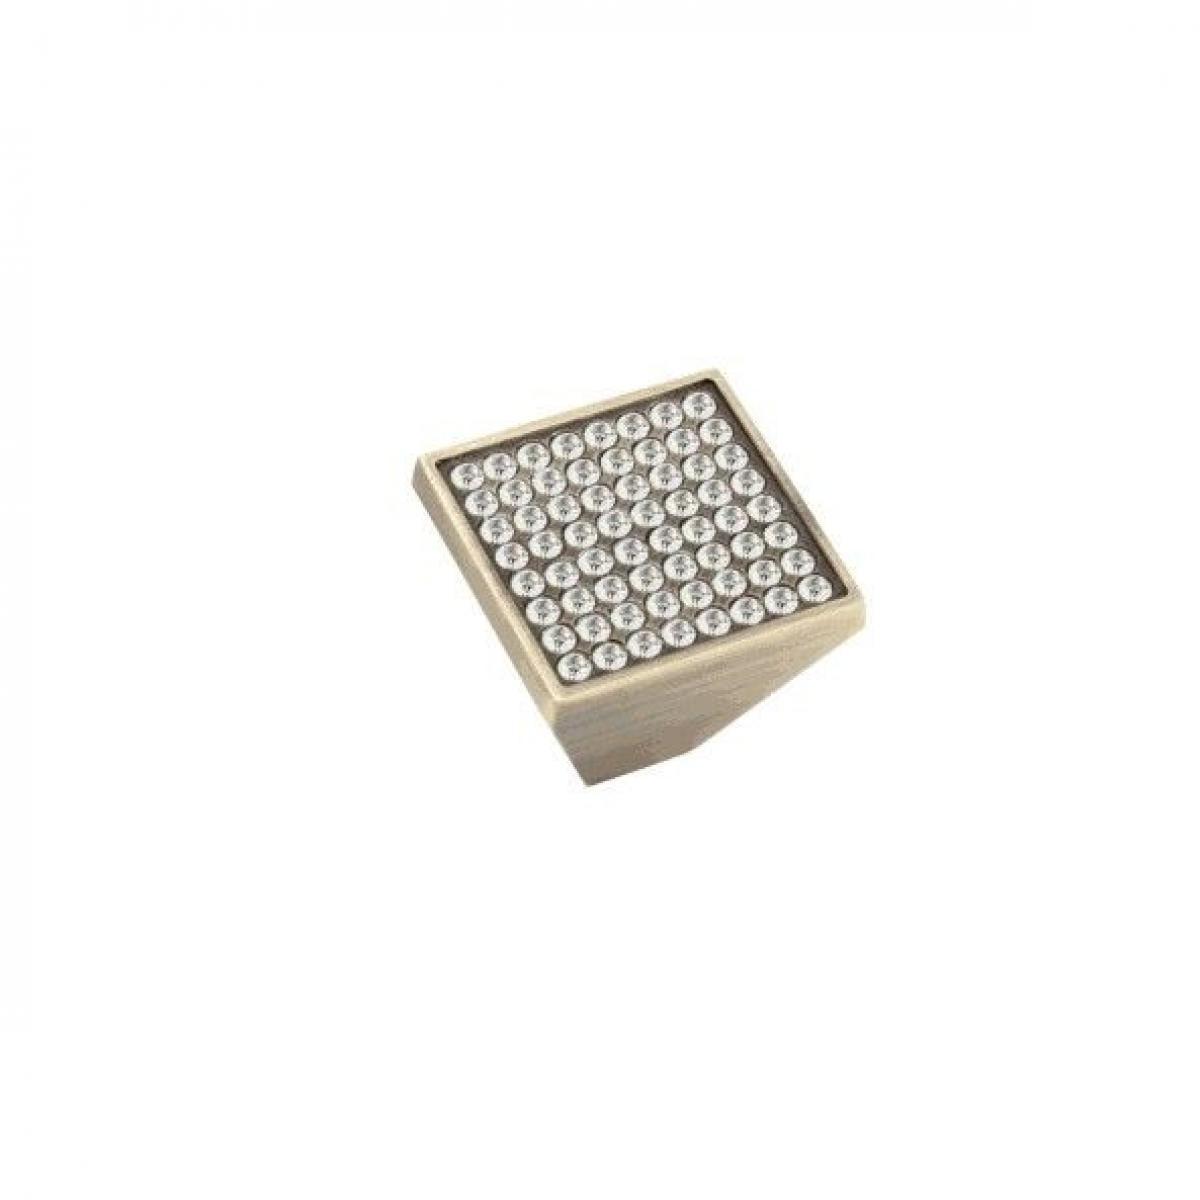 Ручка-кнопка 407 замак/кристаллы бронза матовая